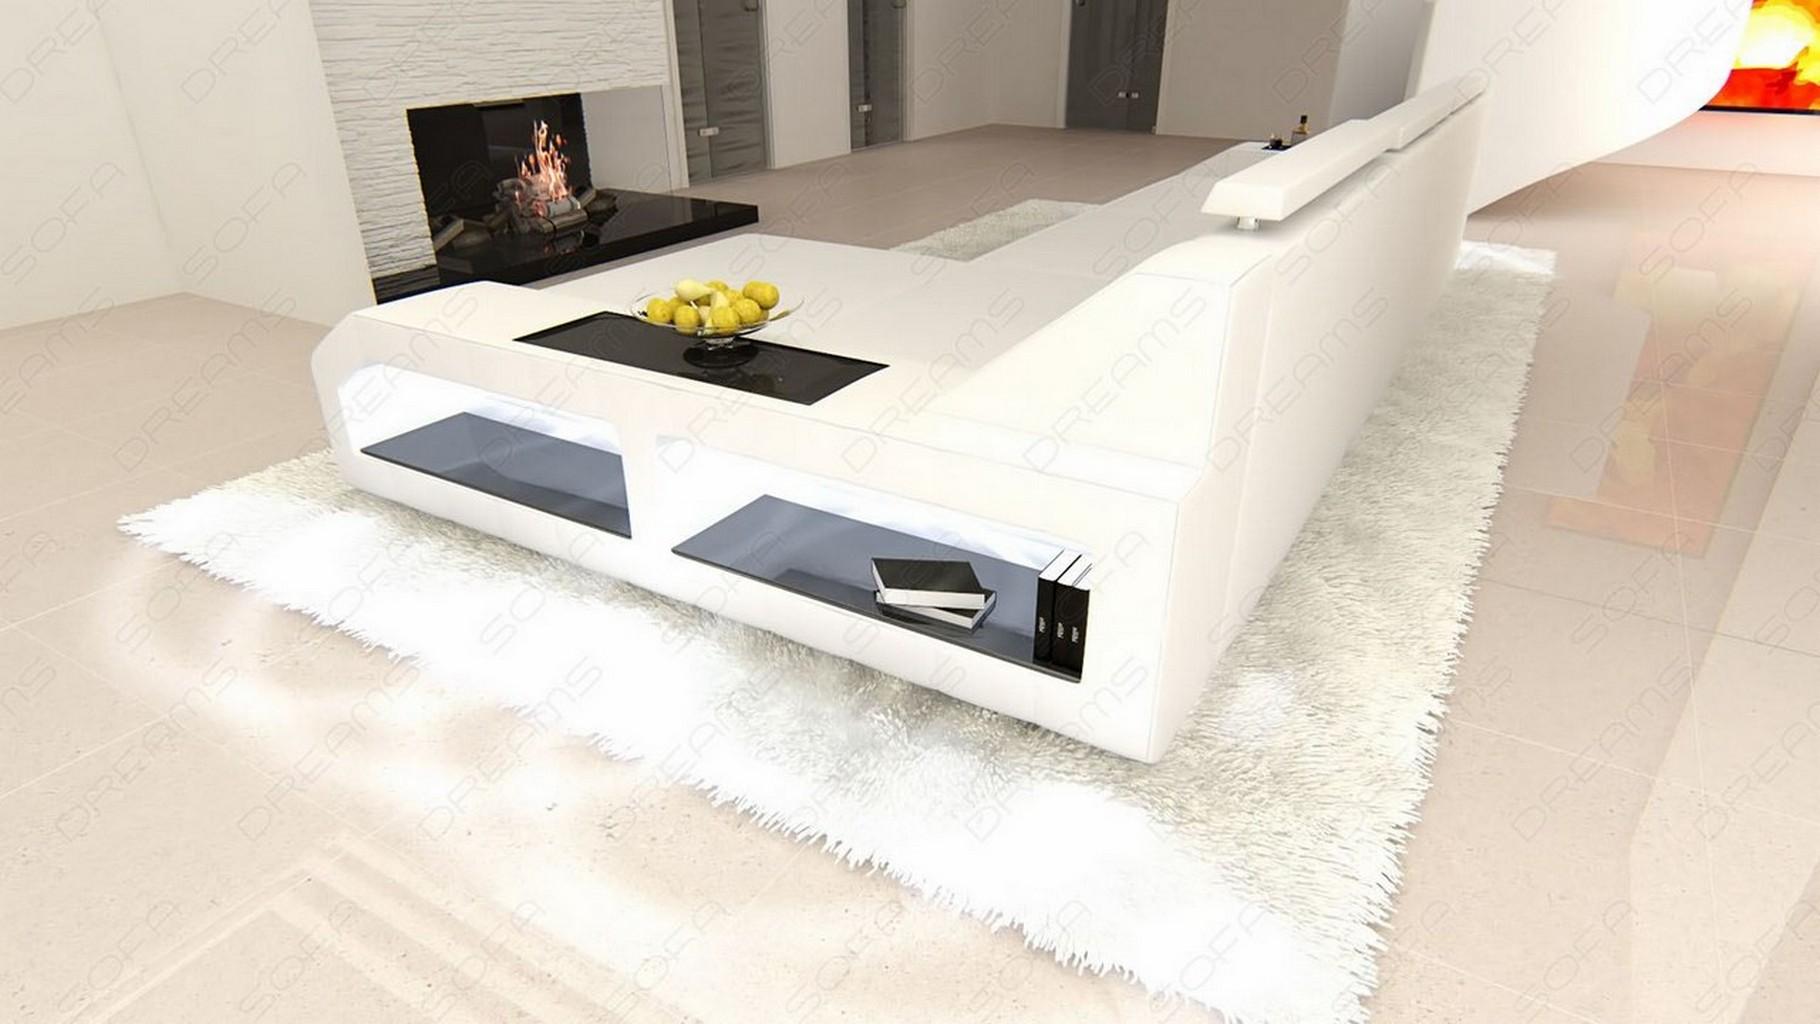 ledersofa eckcouch sofa leder arezzo l form ecksofa beleuchtung viele farben ebay. Black Bedroom Furniture Sets. Home Design Ideas